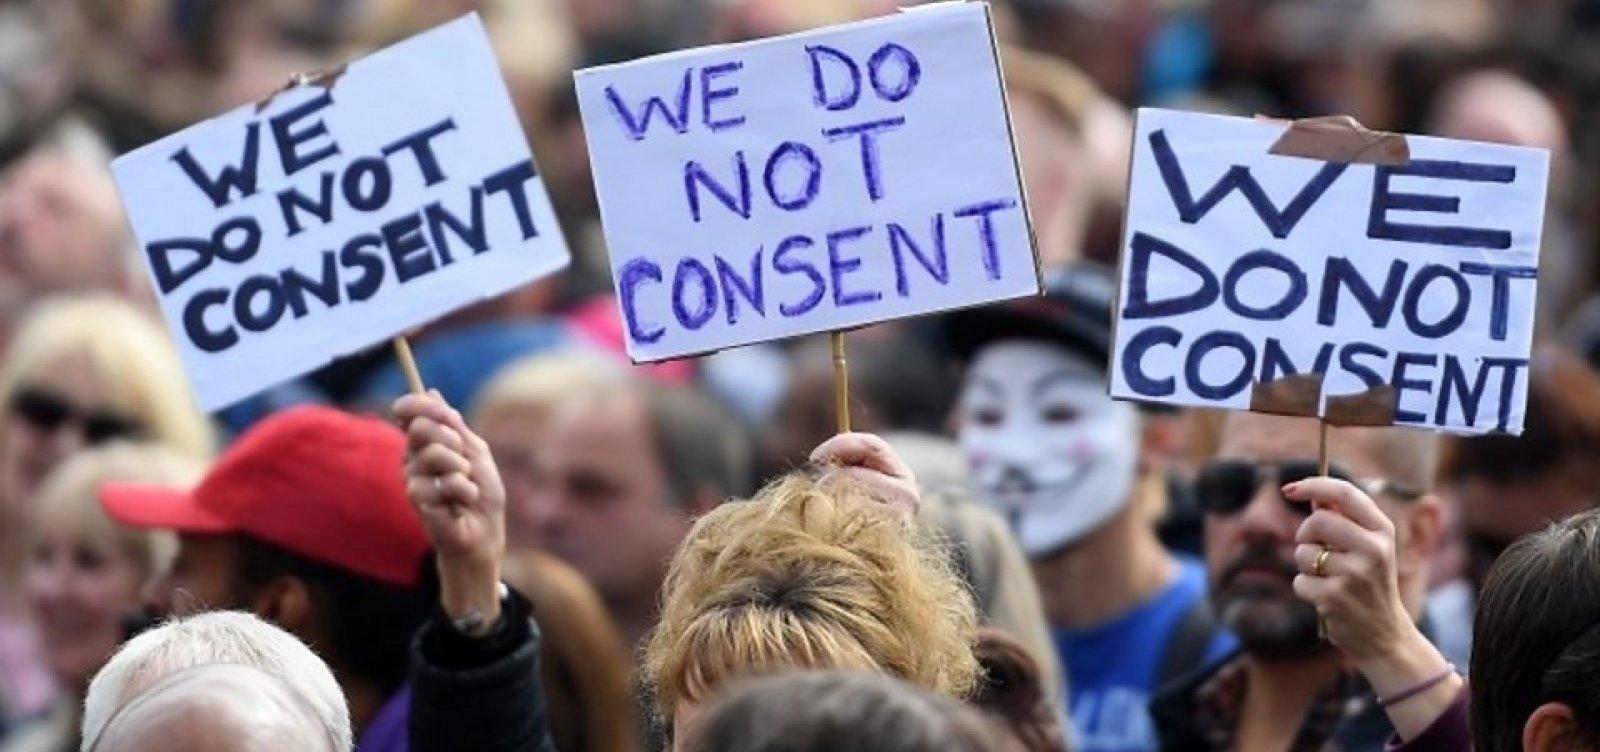 [Sem máscaras, milhares se aglomeram no centro de Londres contra medidas anticoronavírus]